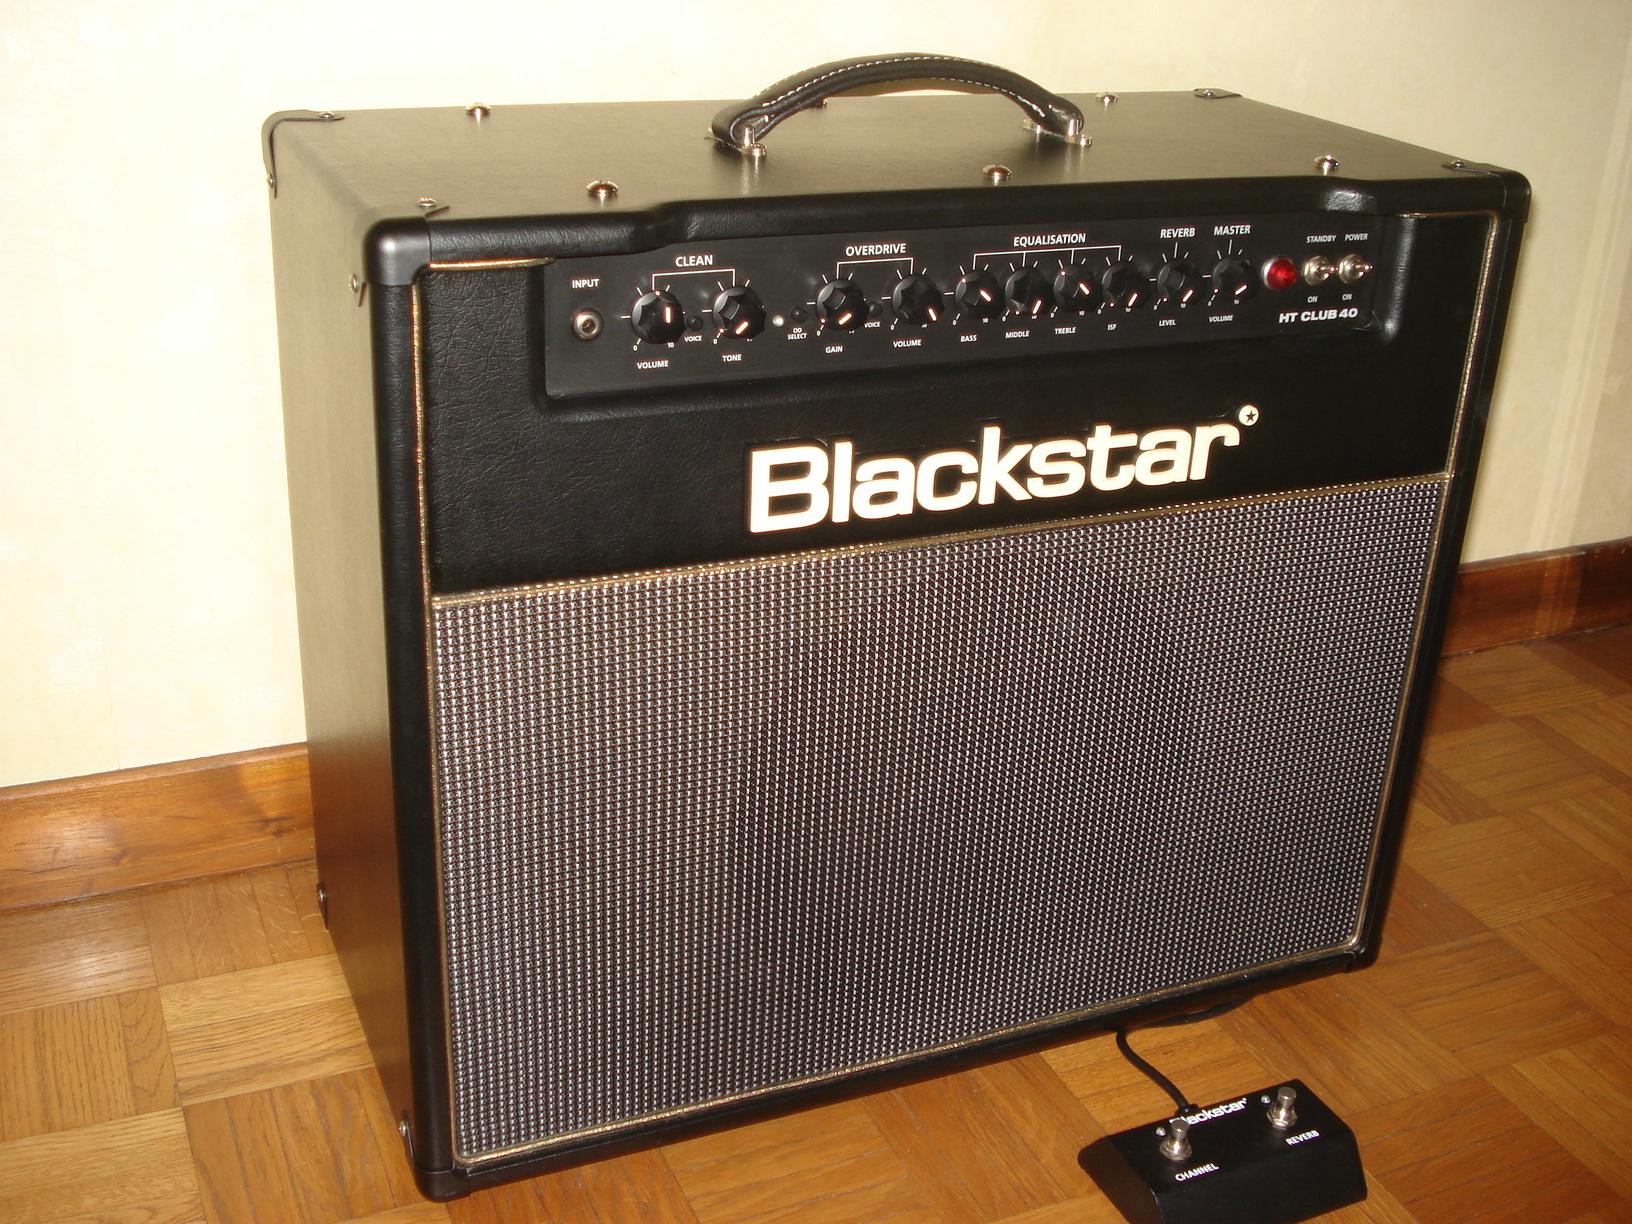 blackstar amplification ht club 40 image 1543279 audiofanzine. Black Bedroom Furniture Sets. Home Design Ideas